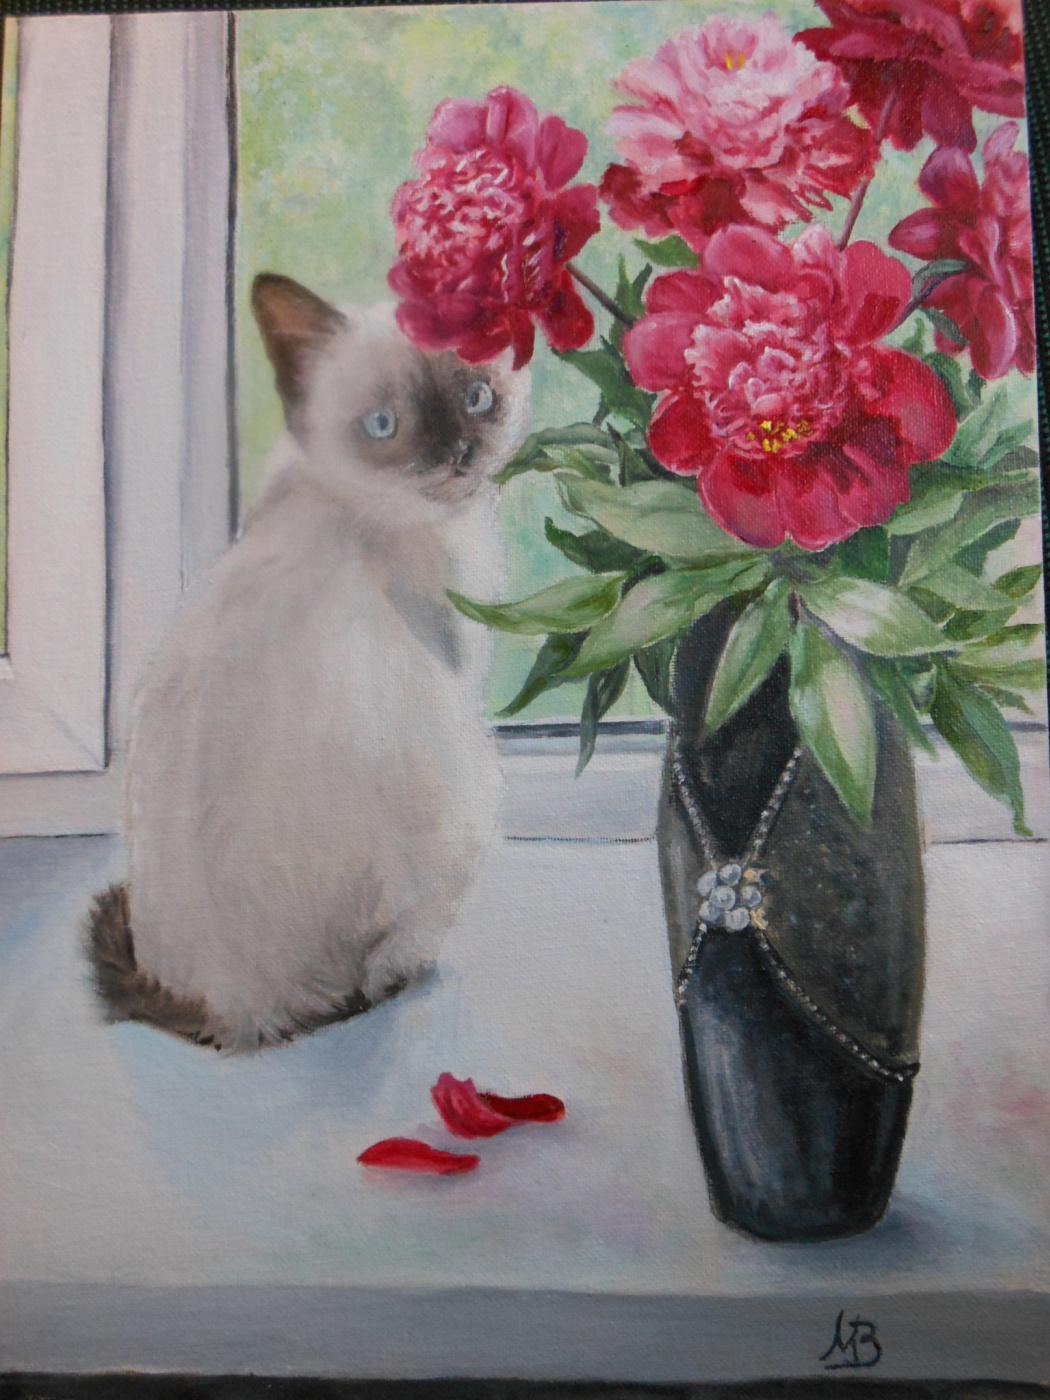 Marina Zaichenko. The cat is sitting on the window